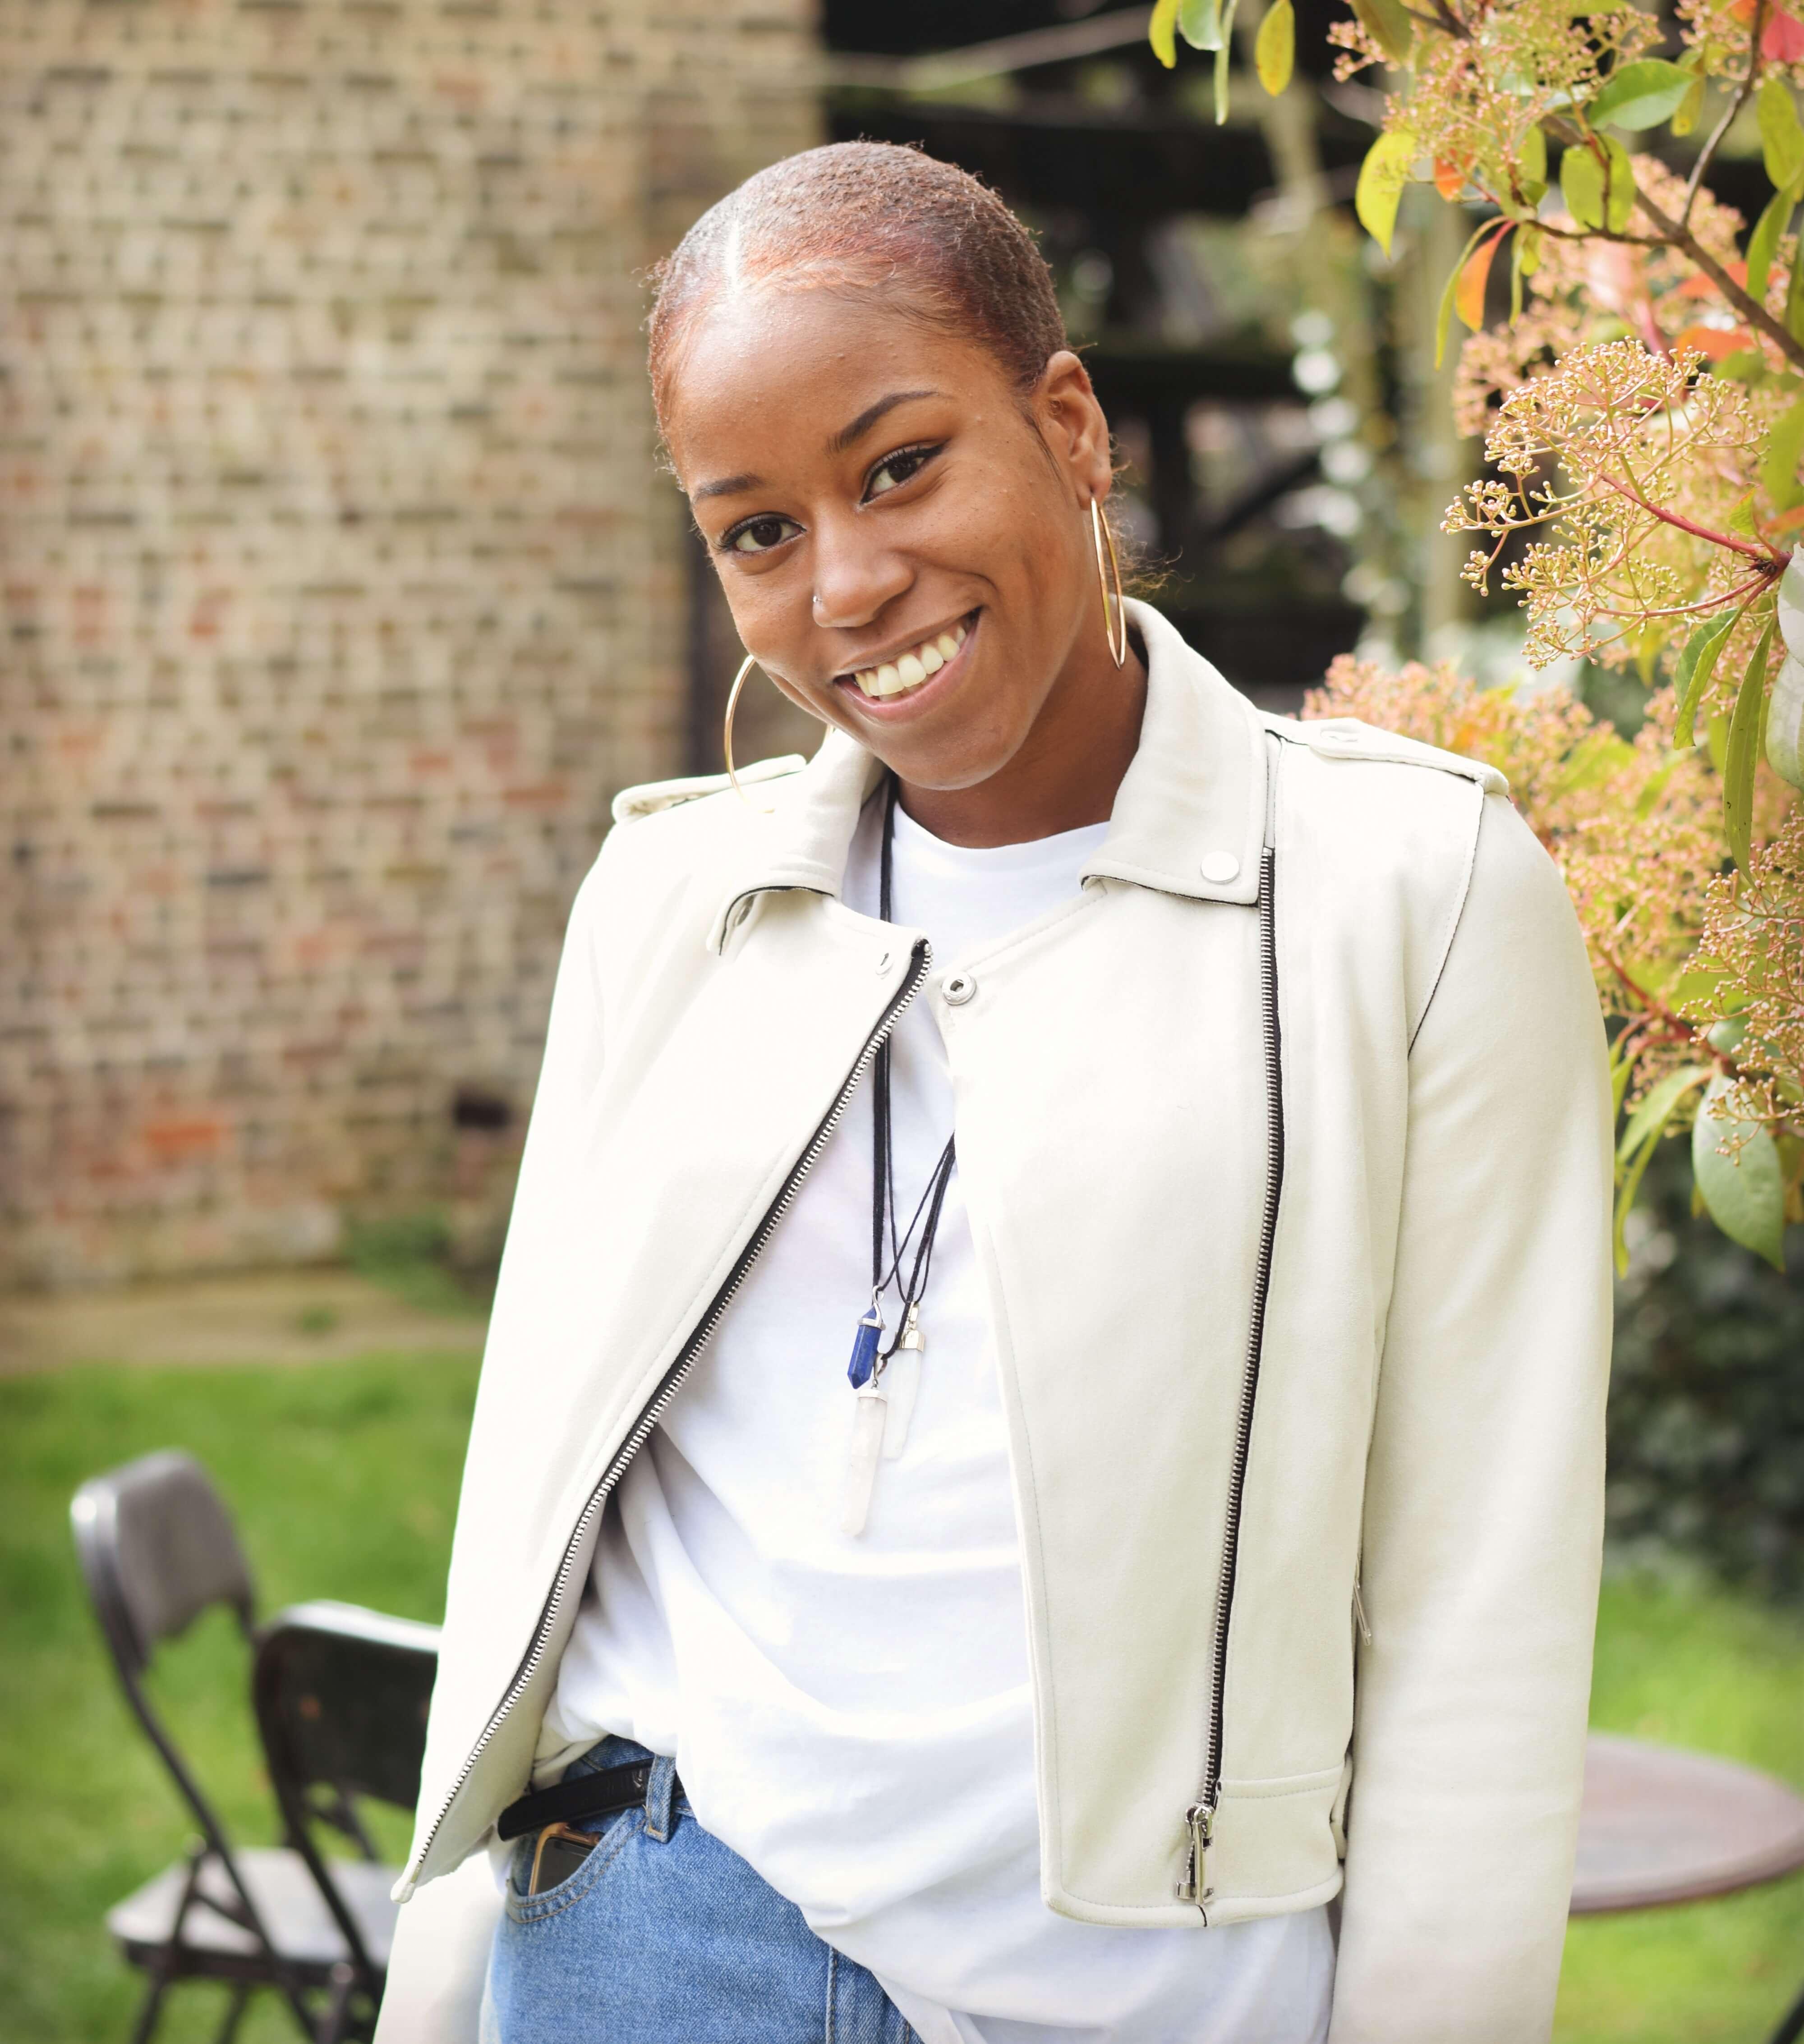 A Gutsy Girl's Story Living with Crohn's Disease agutsygirl.com #guthealth #crohns #ibs Ashara